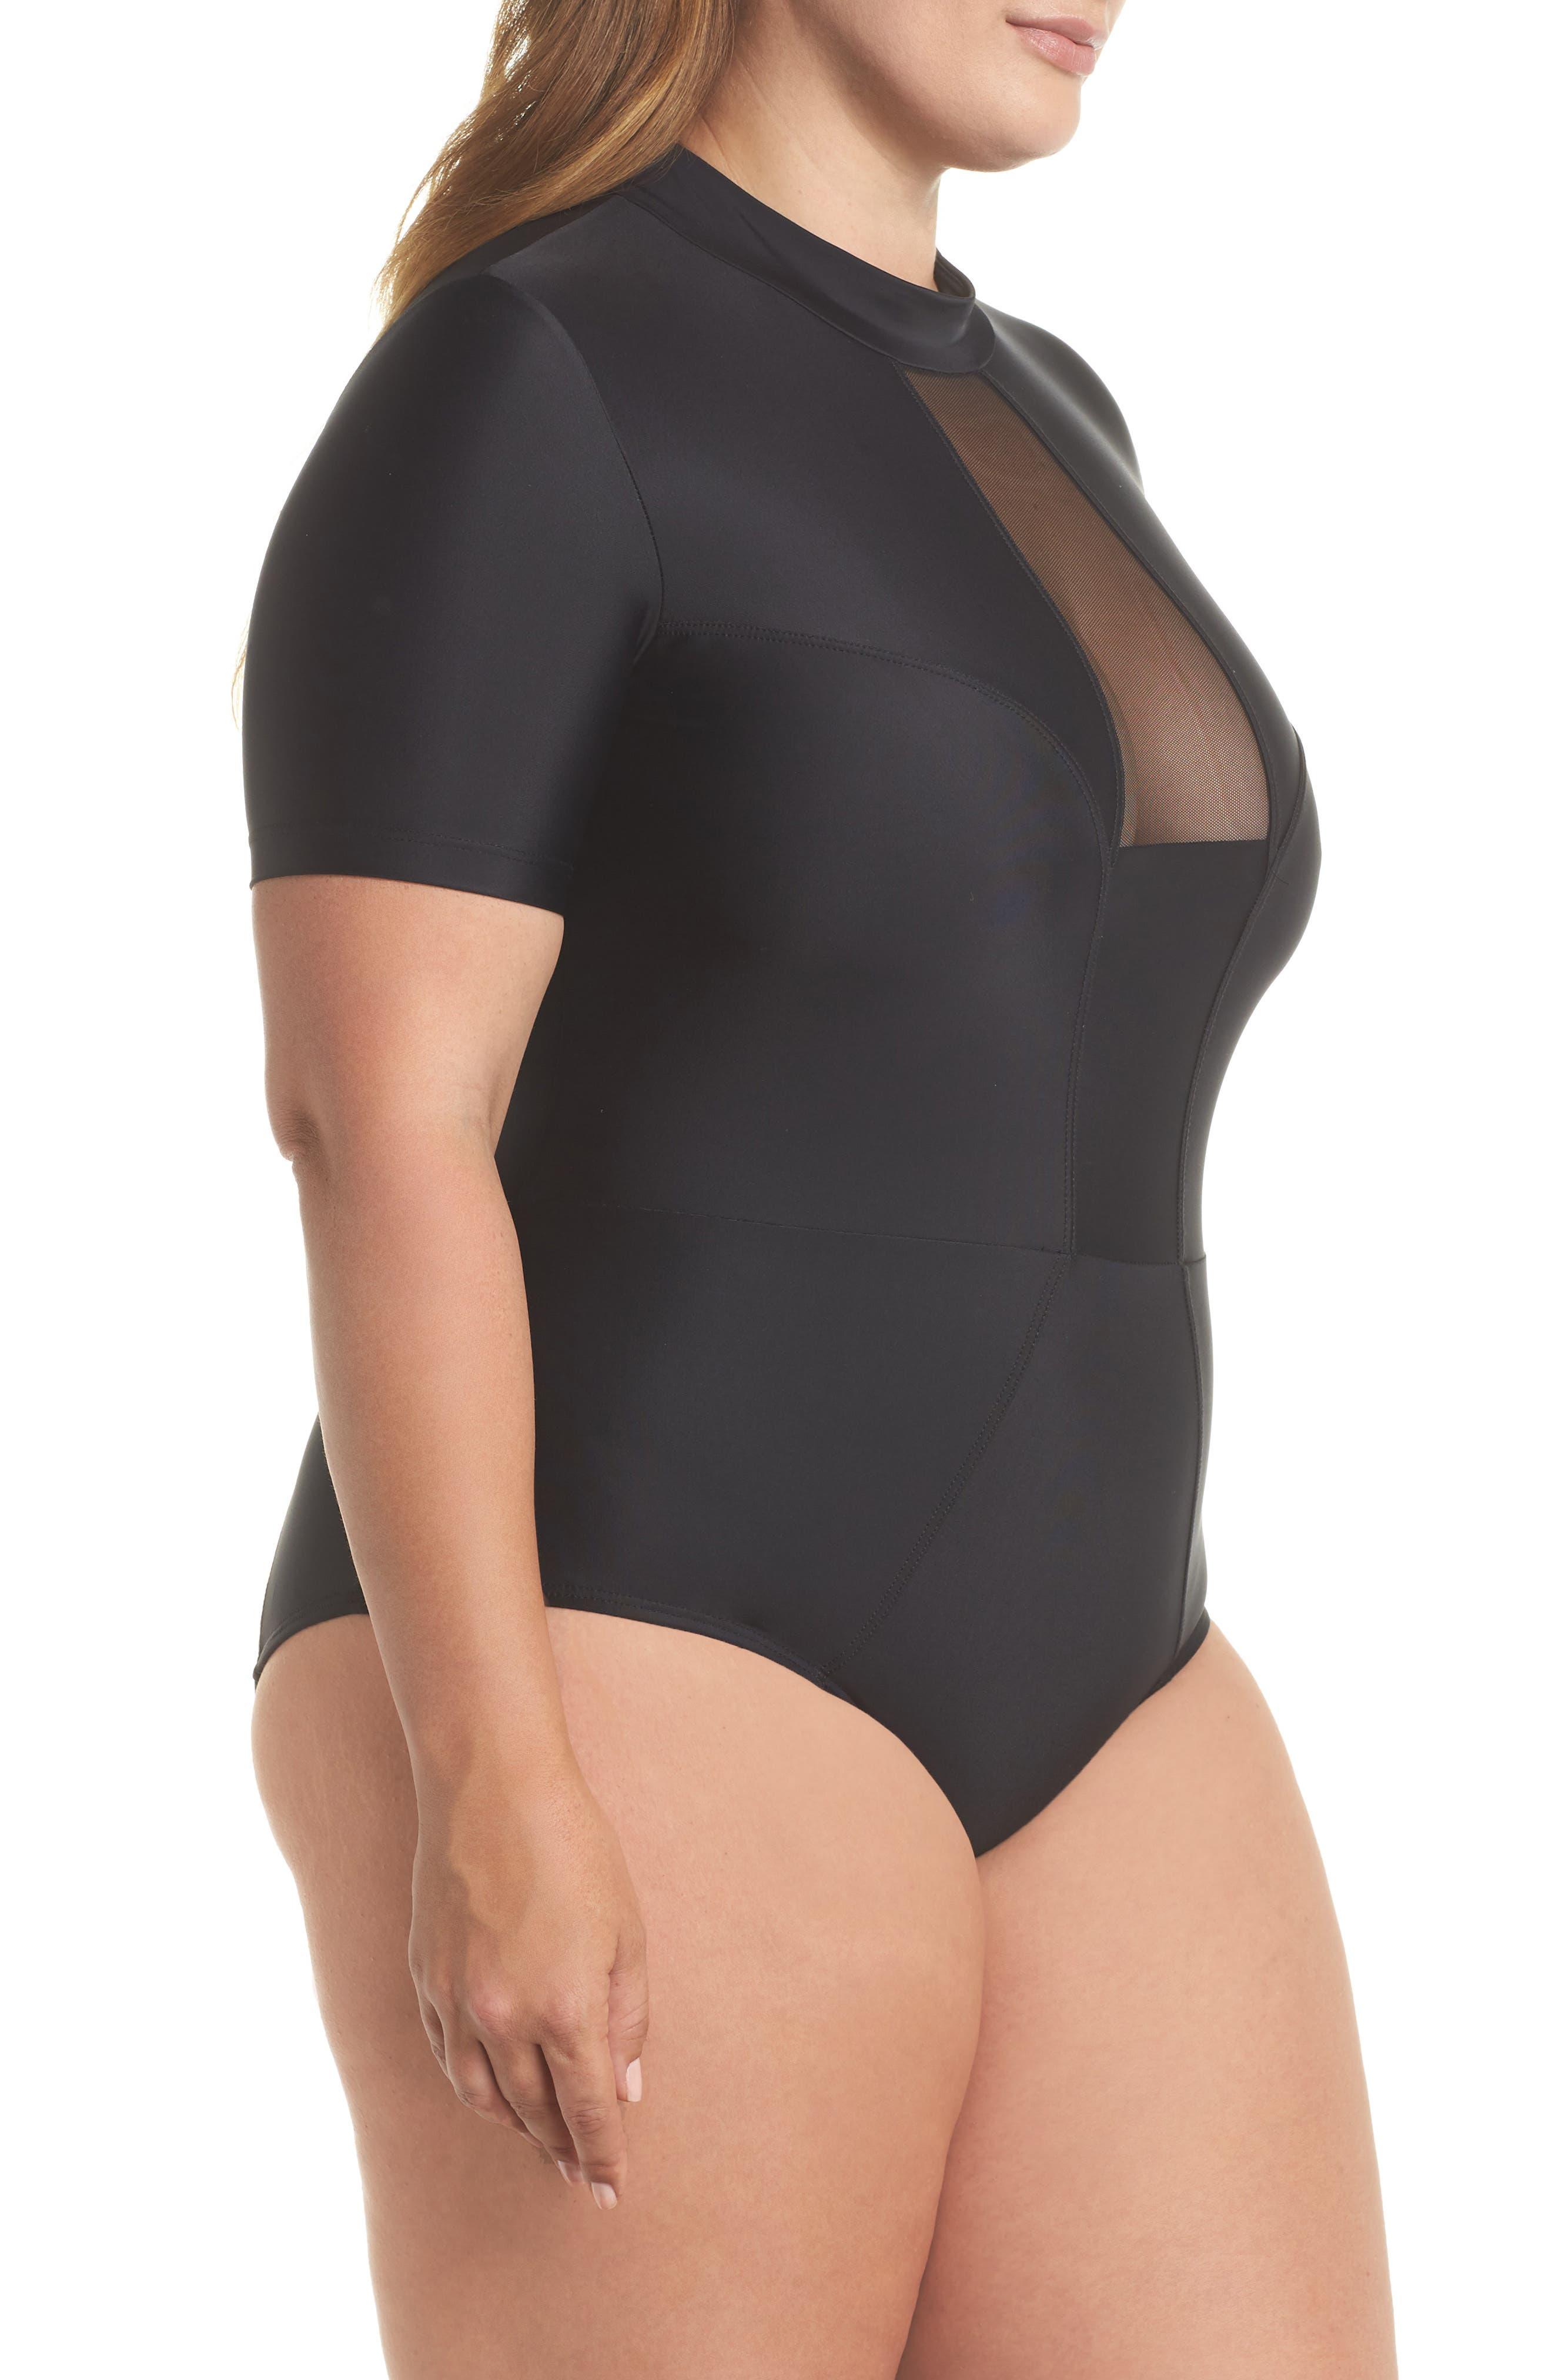 Tidal Back Zip One-Piece Swimsuit,                             Alternate thumbnail 3, color,                             Black